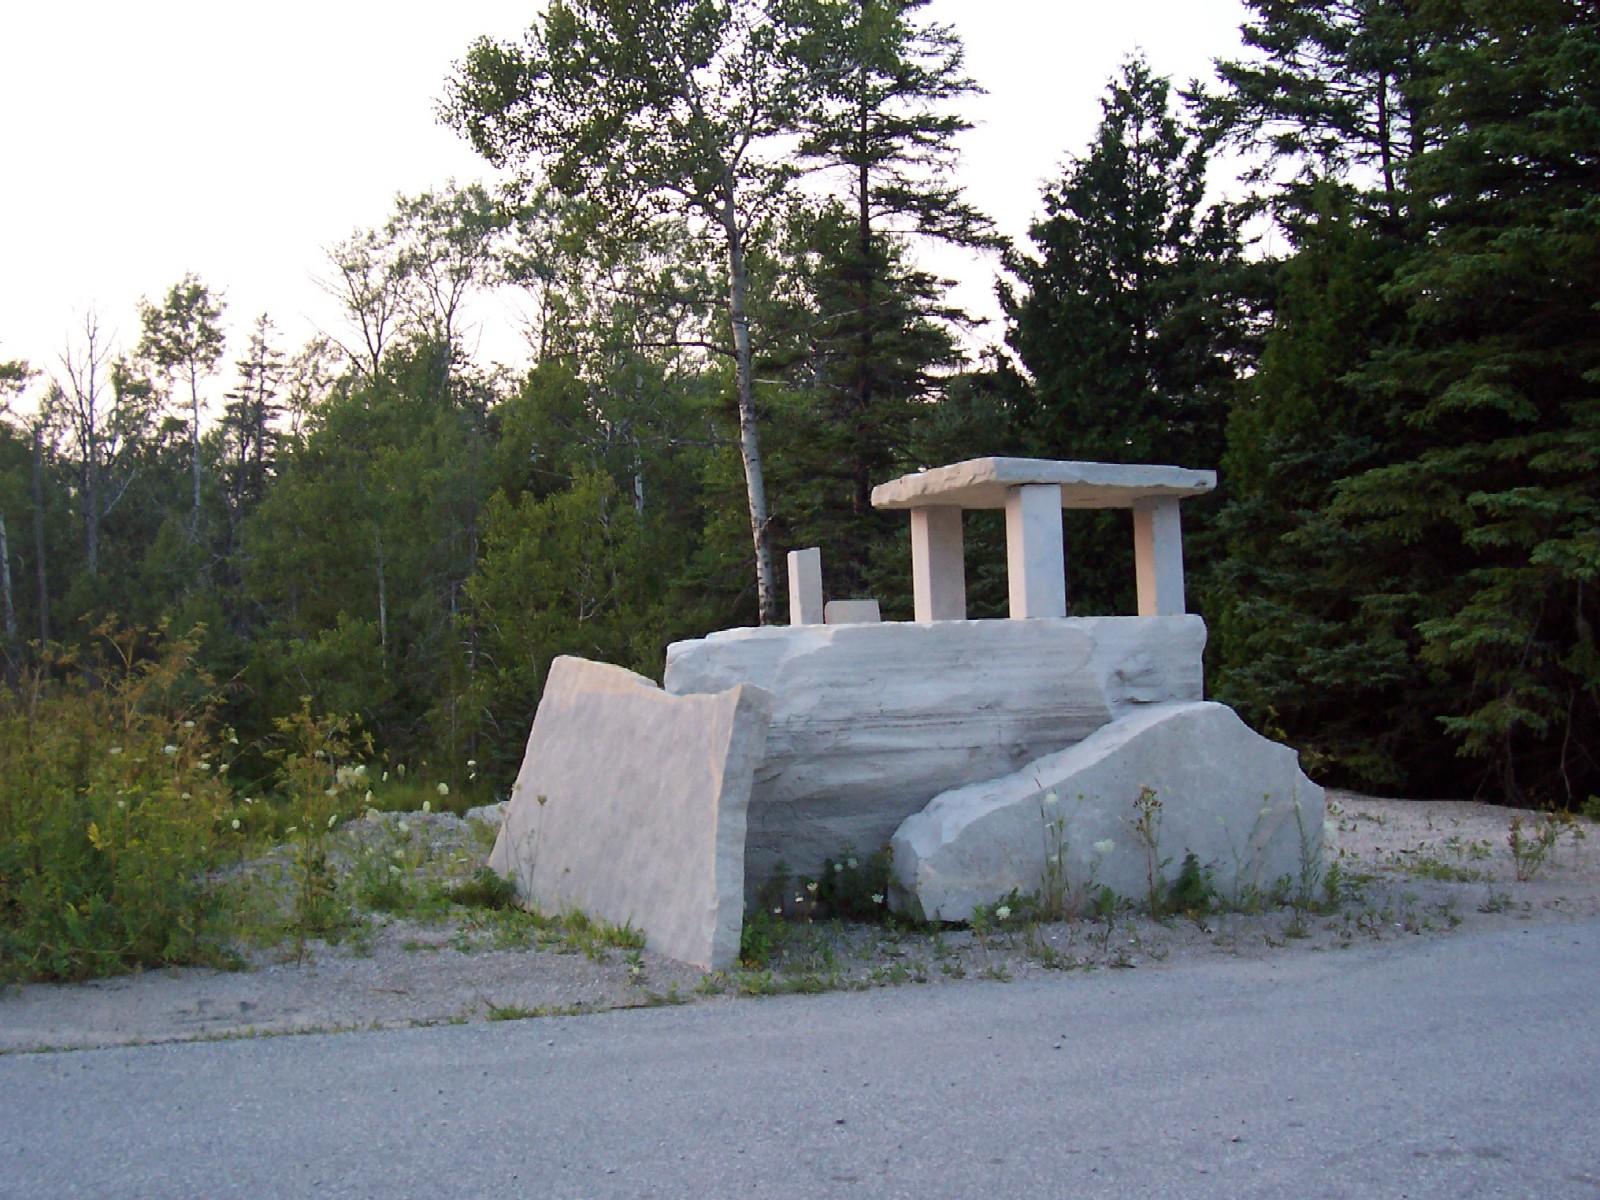 Stone dozer, Bspo06, Bulldozer, Construction, Stone, HQ Photo